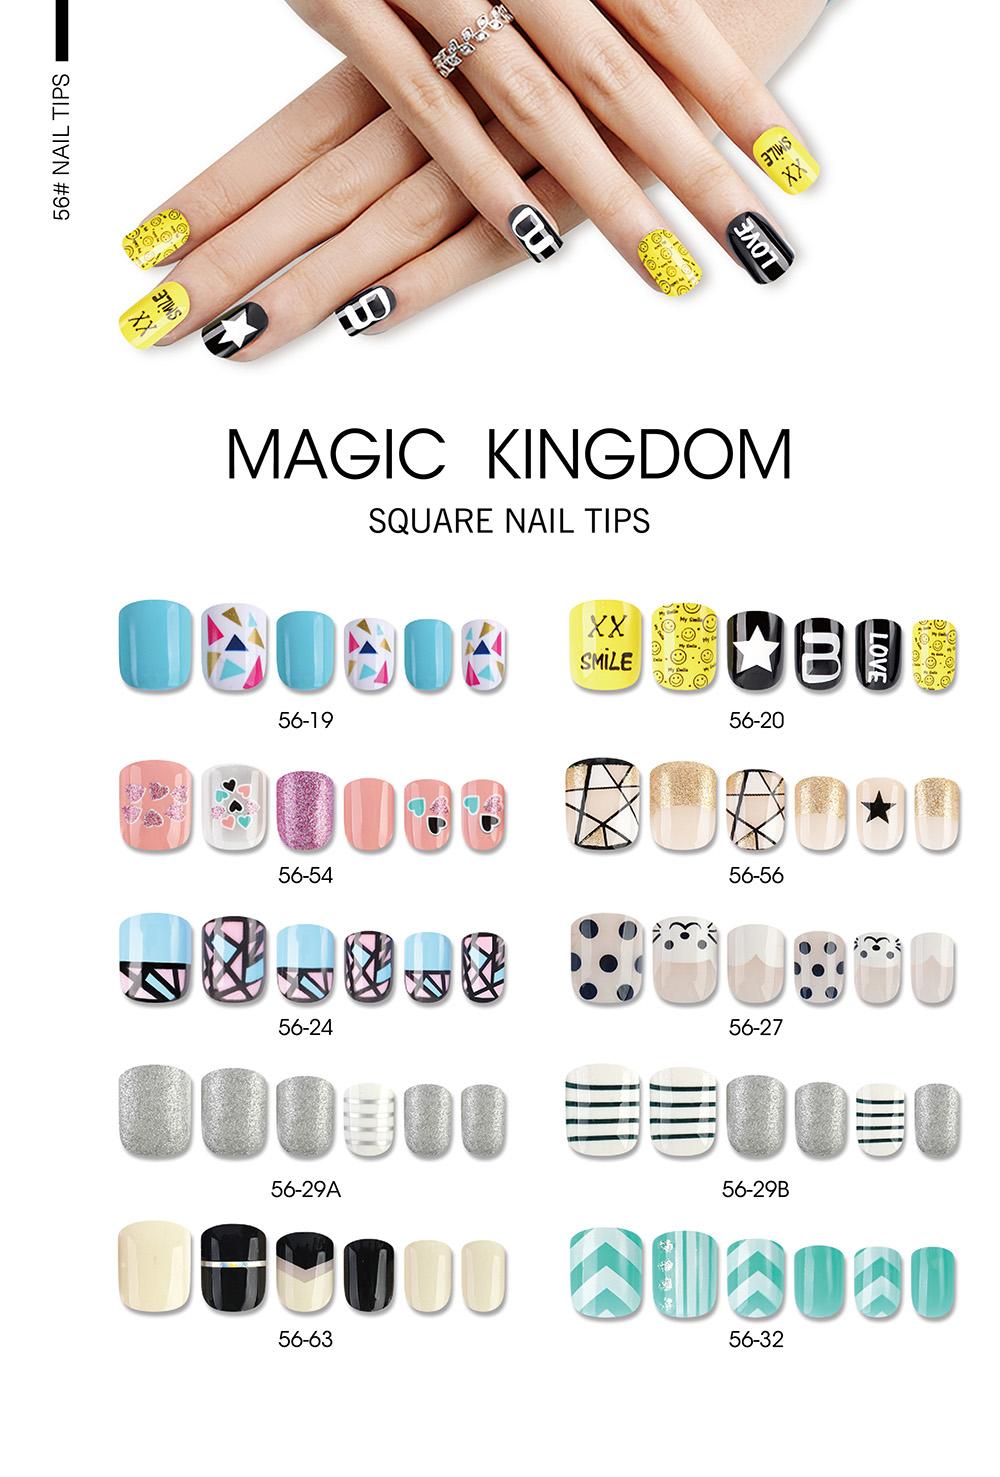 MAGIC KINGDOM SQUARE NAIL TIPS